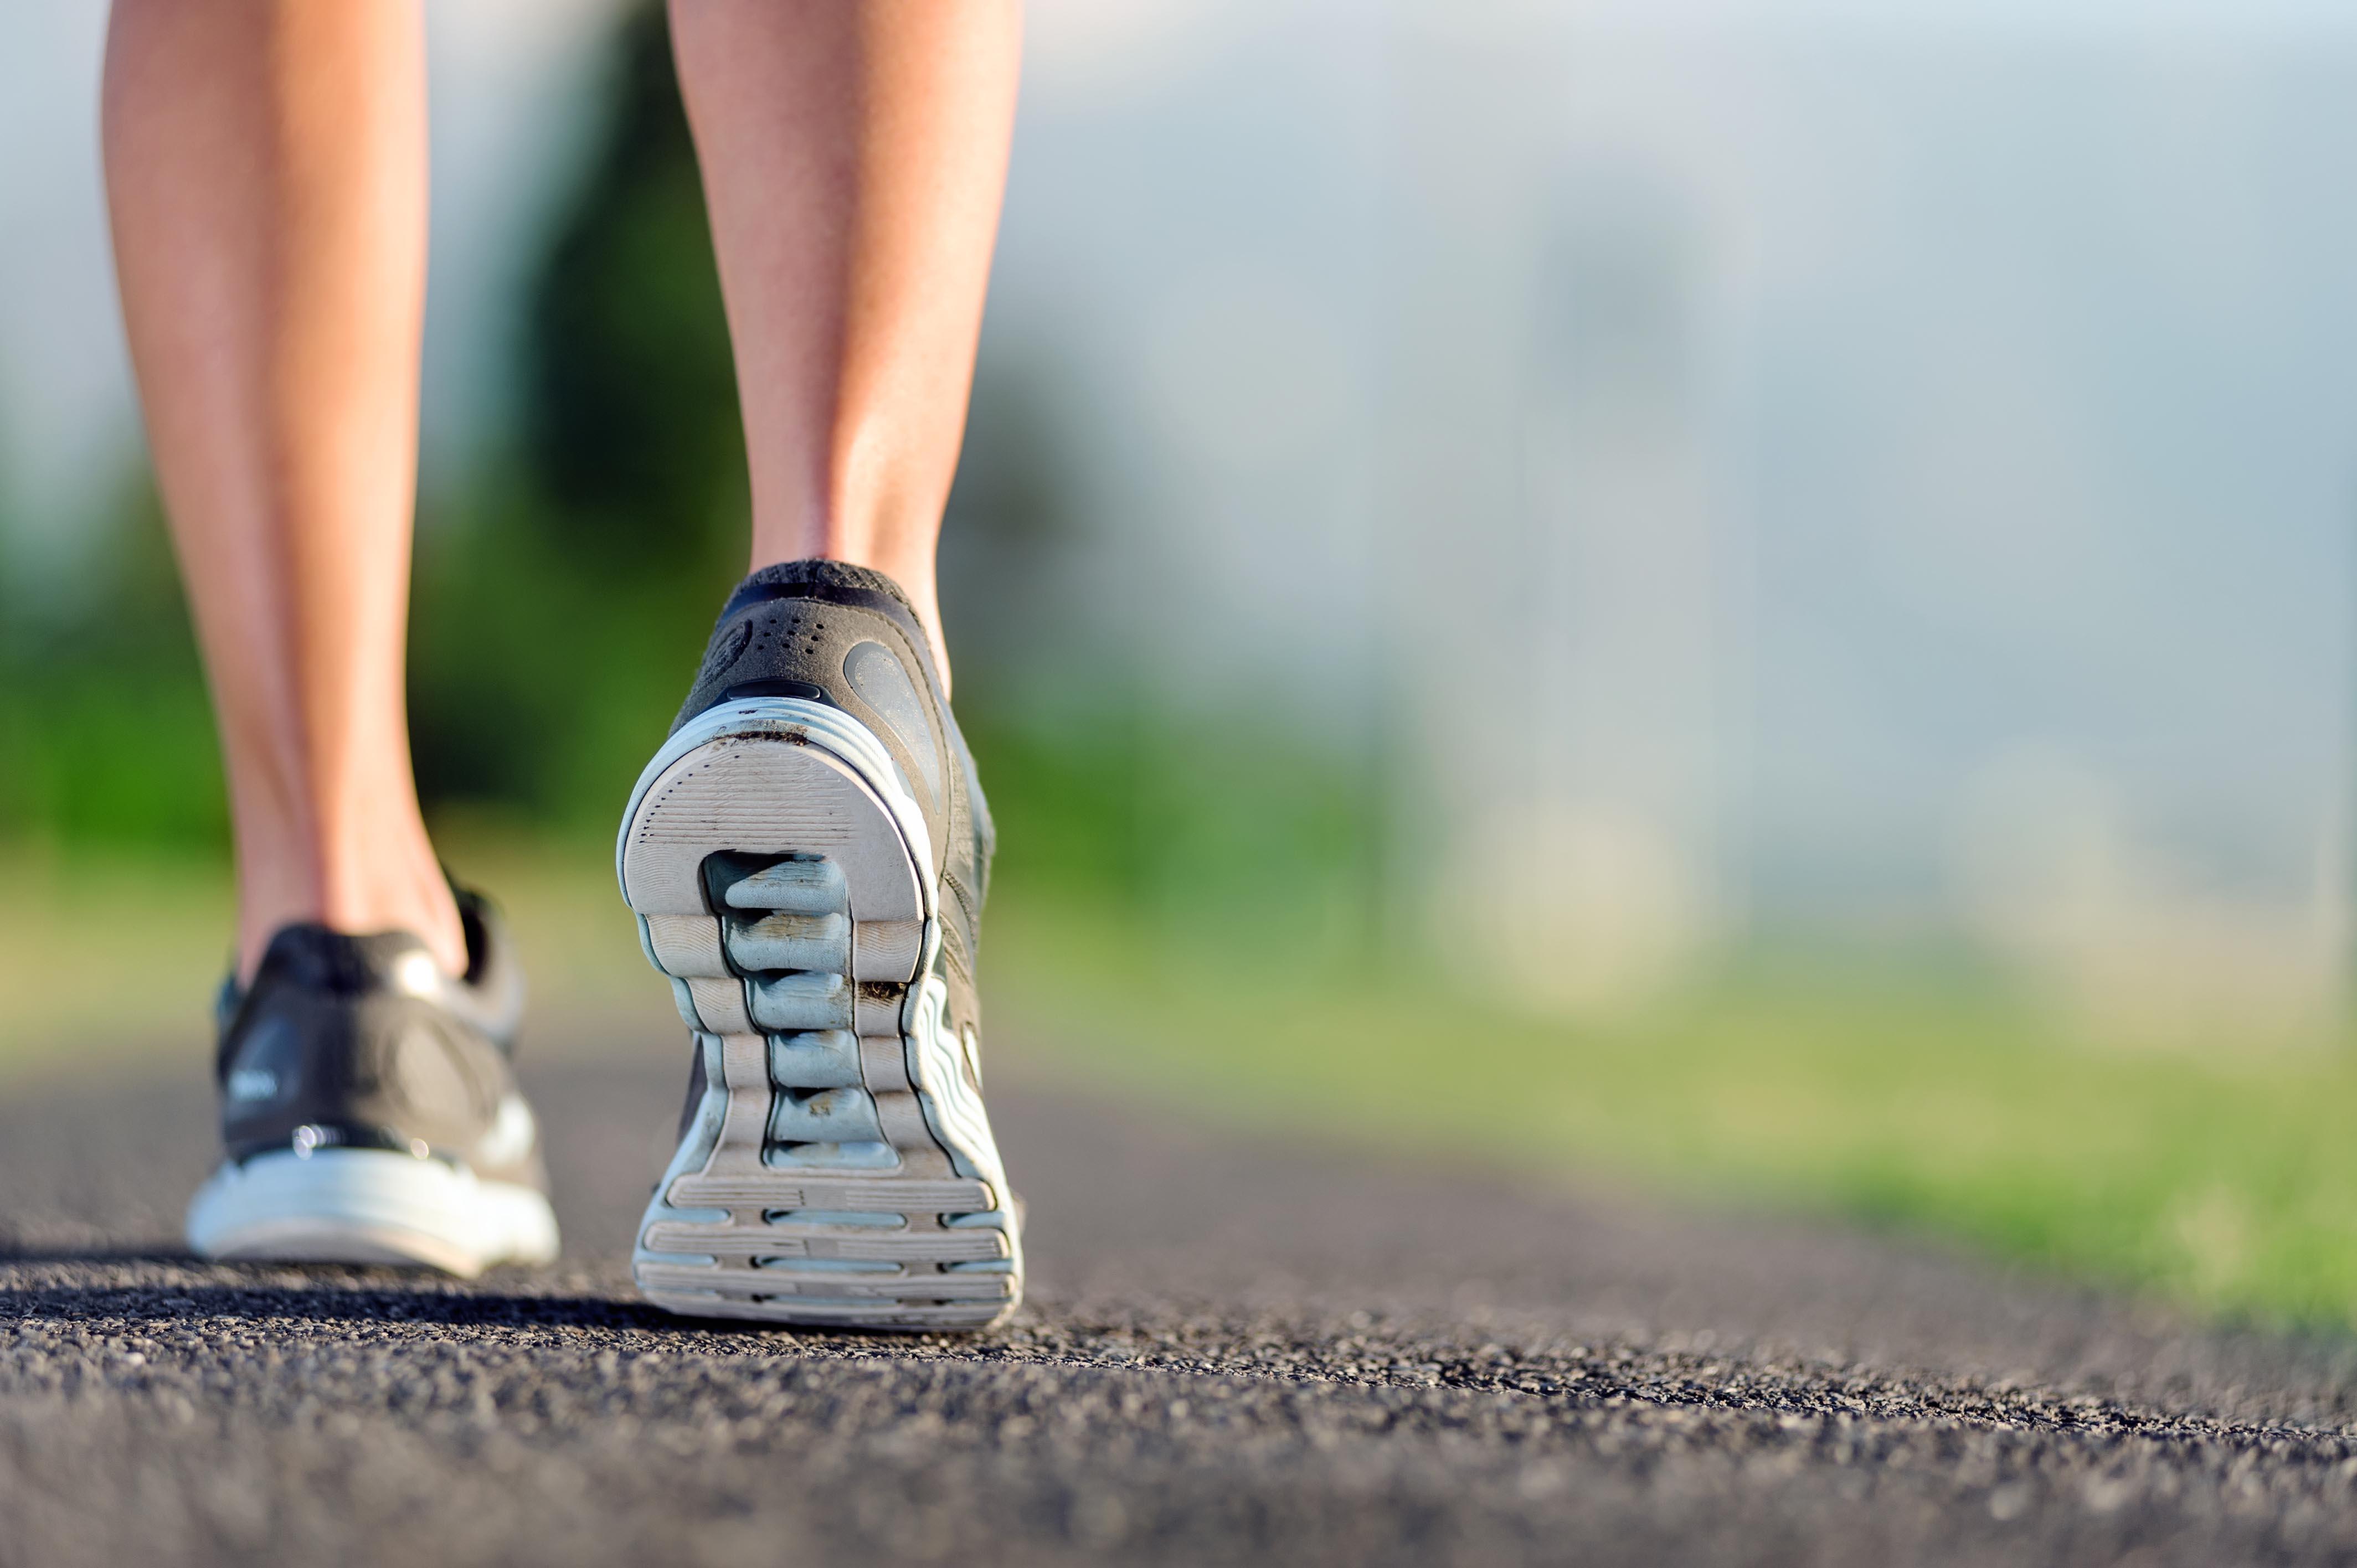 Miliki 4 Perlengkapan Ini Kalau Kamu Mau Rutin Berolahraga